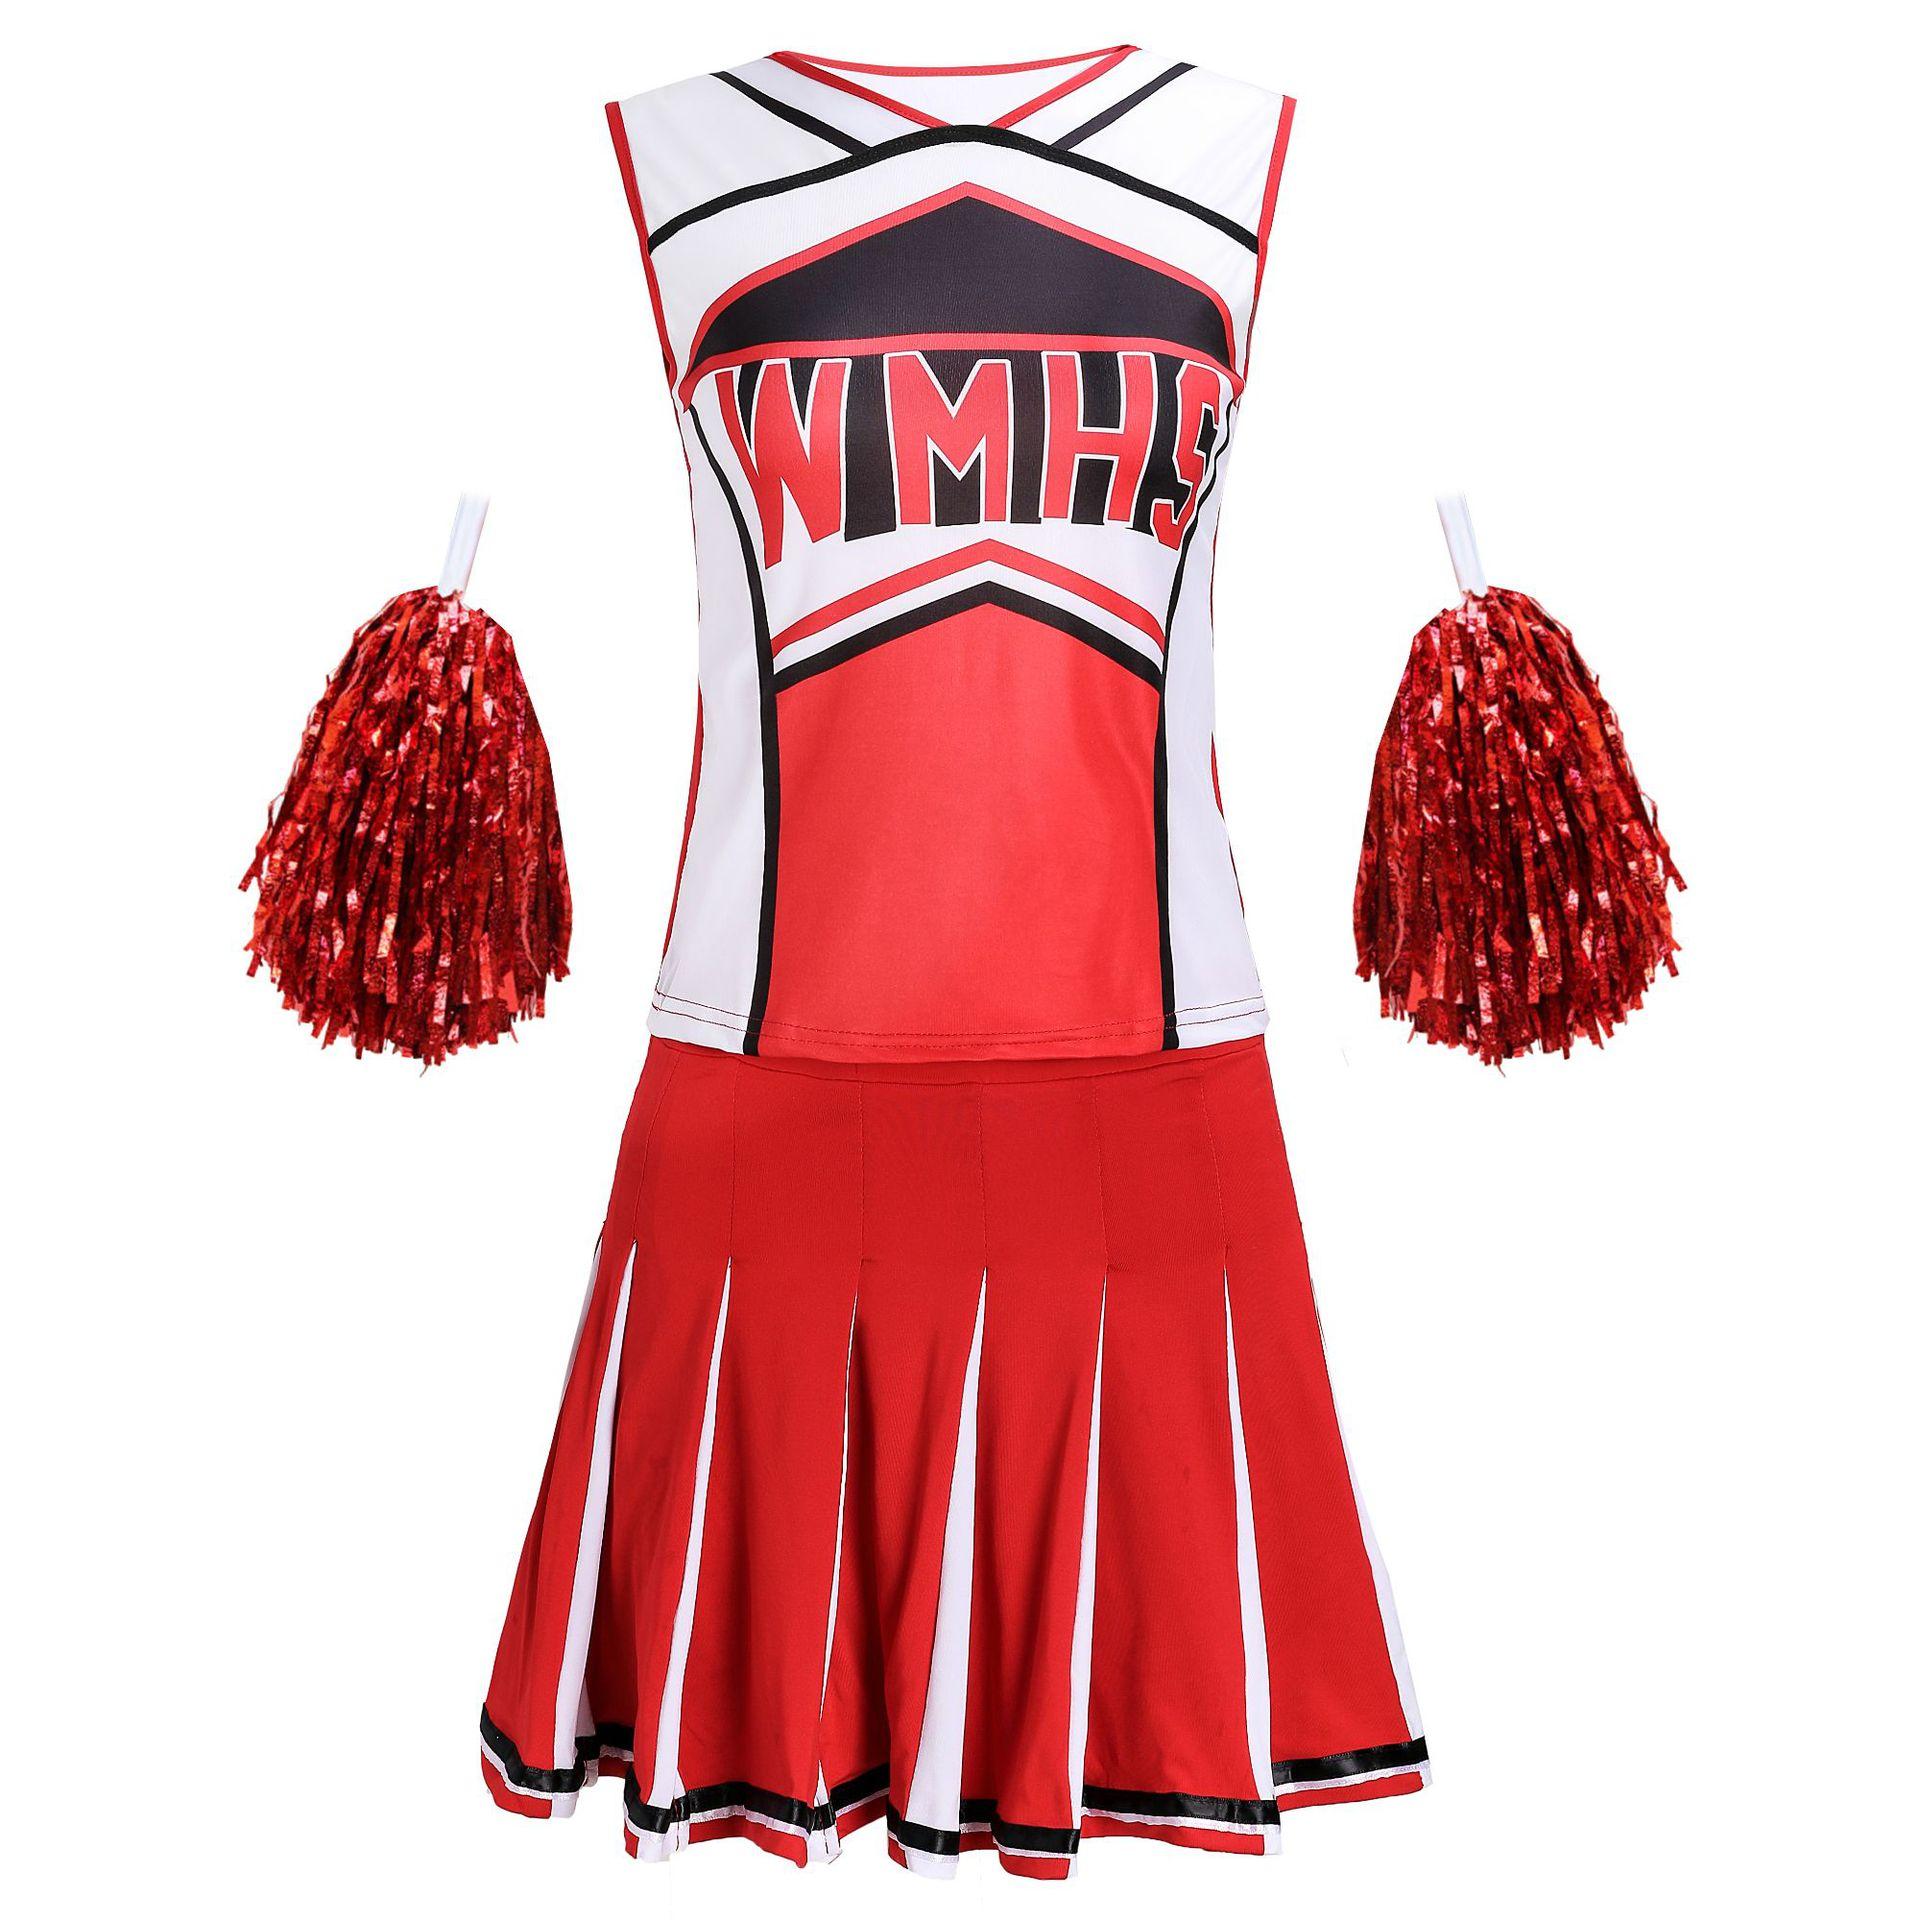 Cheerleader Costume Schoolgirl Lingerie Tank Top Petticoat Pom Cheerleader 2 Pcs Suit Red Nightclub Party Football Baby Uniform